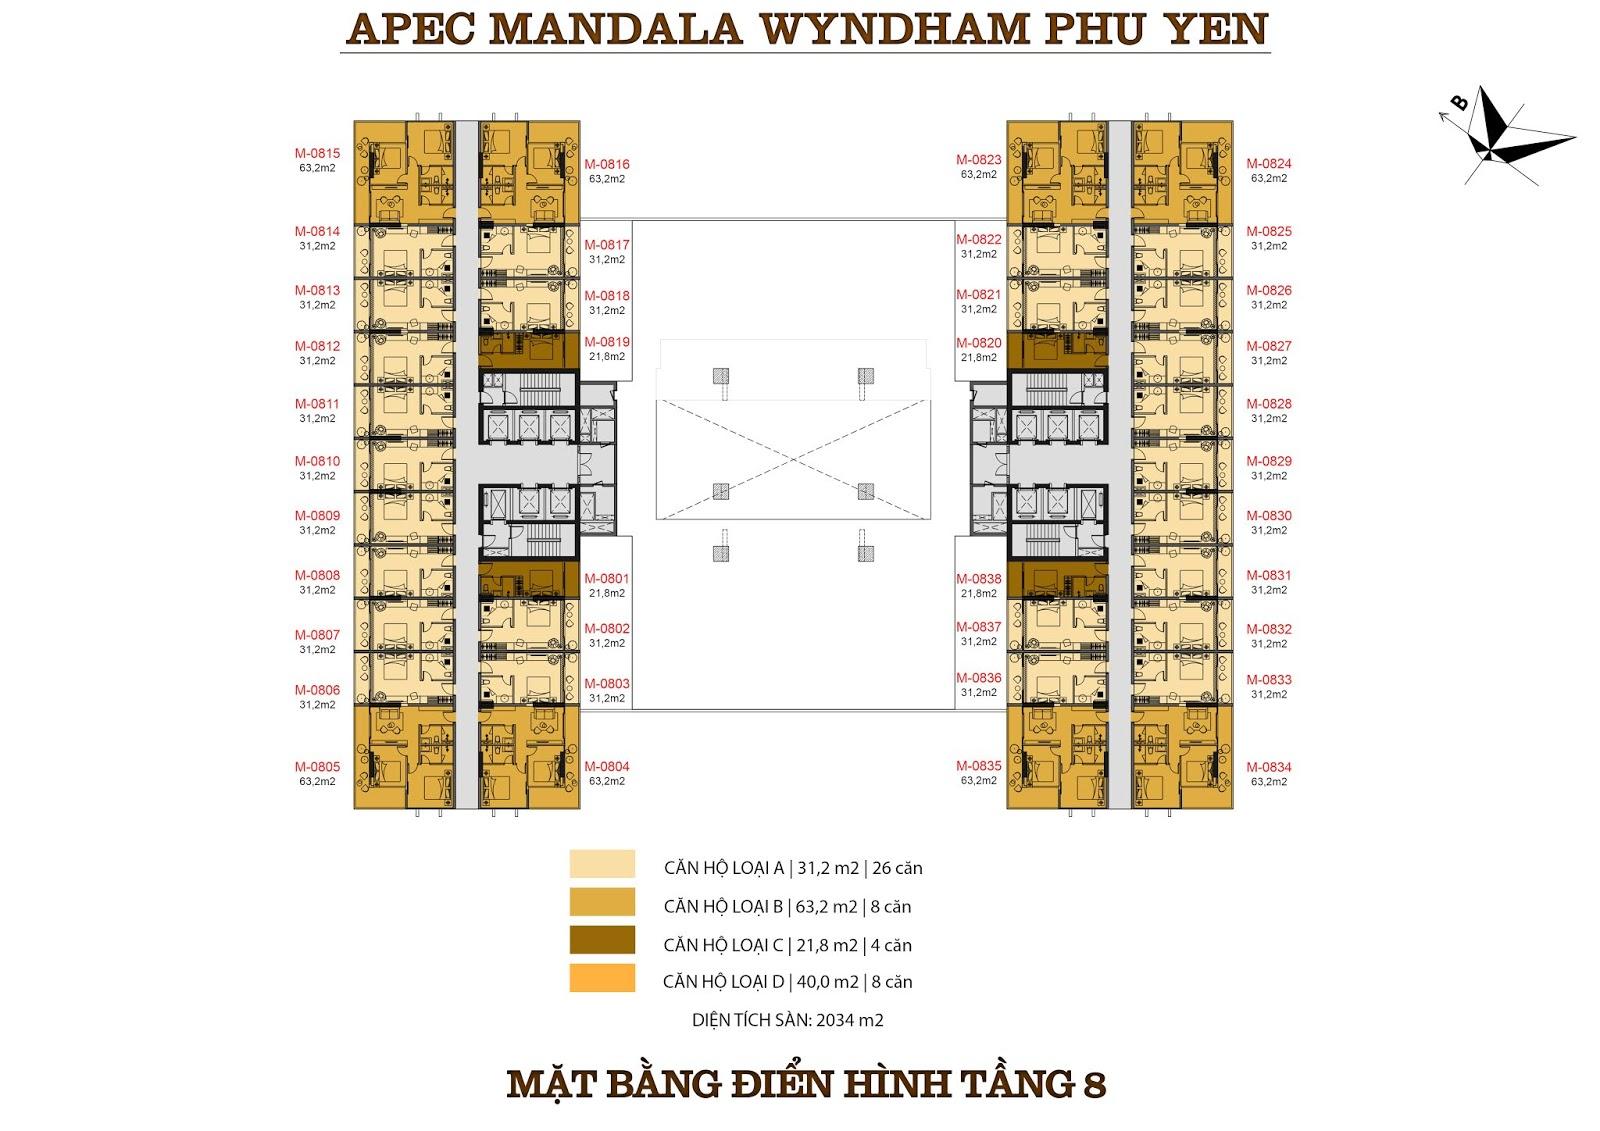 mat-bang-condotel-apec-mandala-wyndham